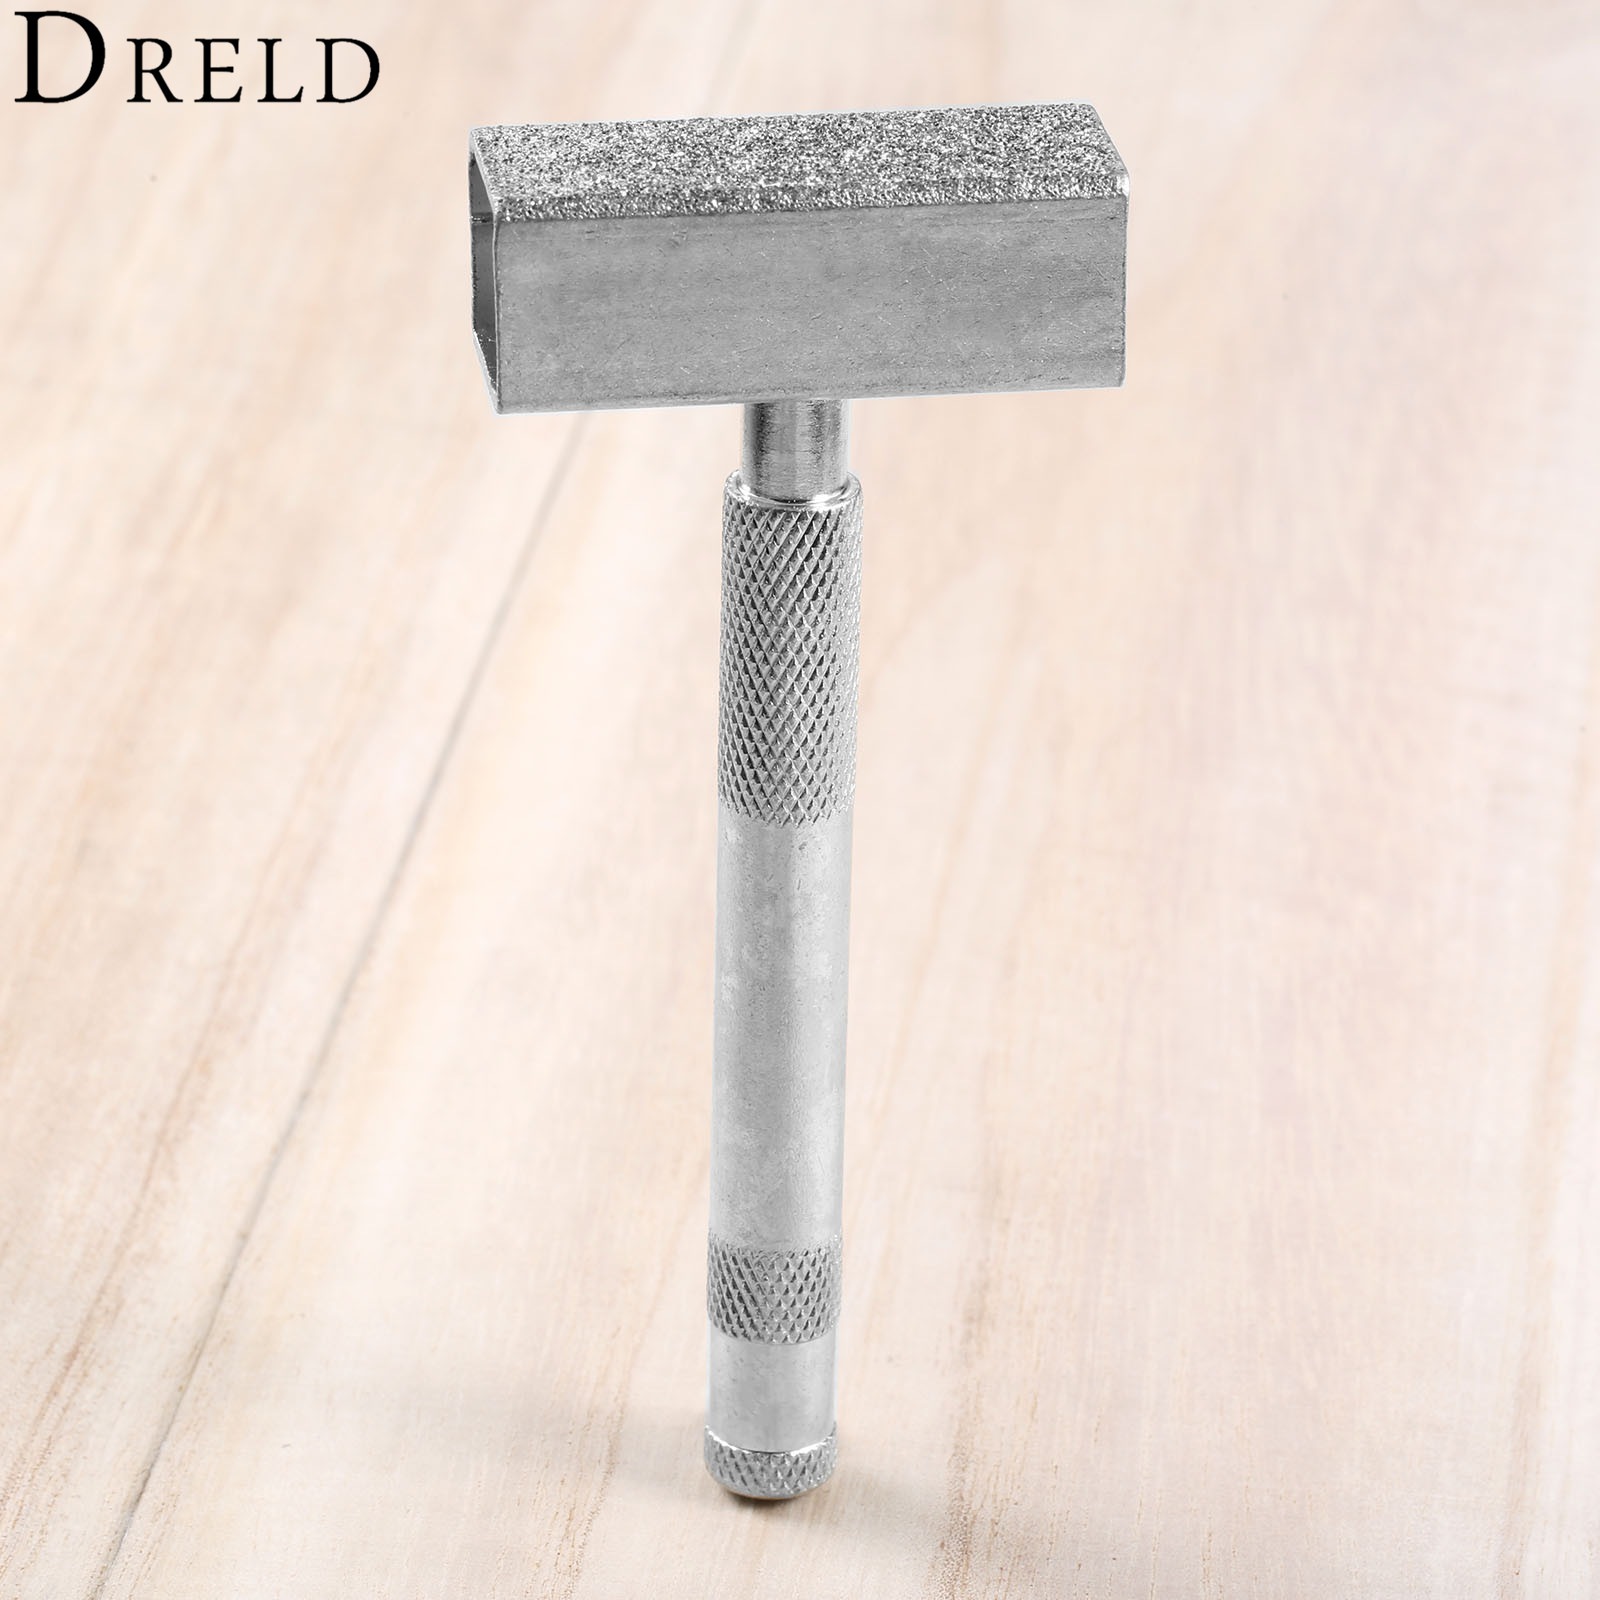 DRELD 1Pc Handheld Diamond Dressing Tool Grinding Wheel Disc Stone Dresser Bench Grinder Grinding Tool